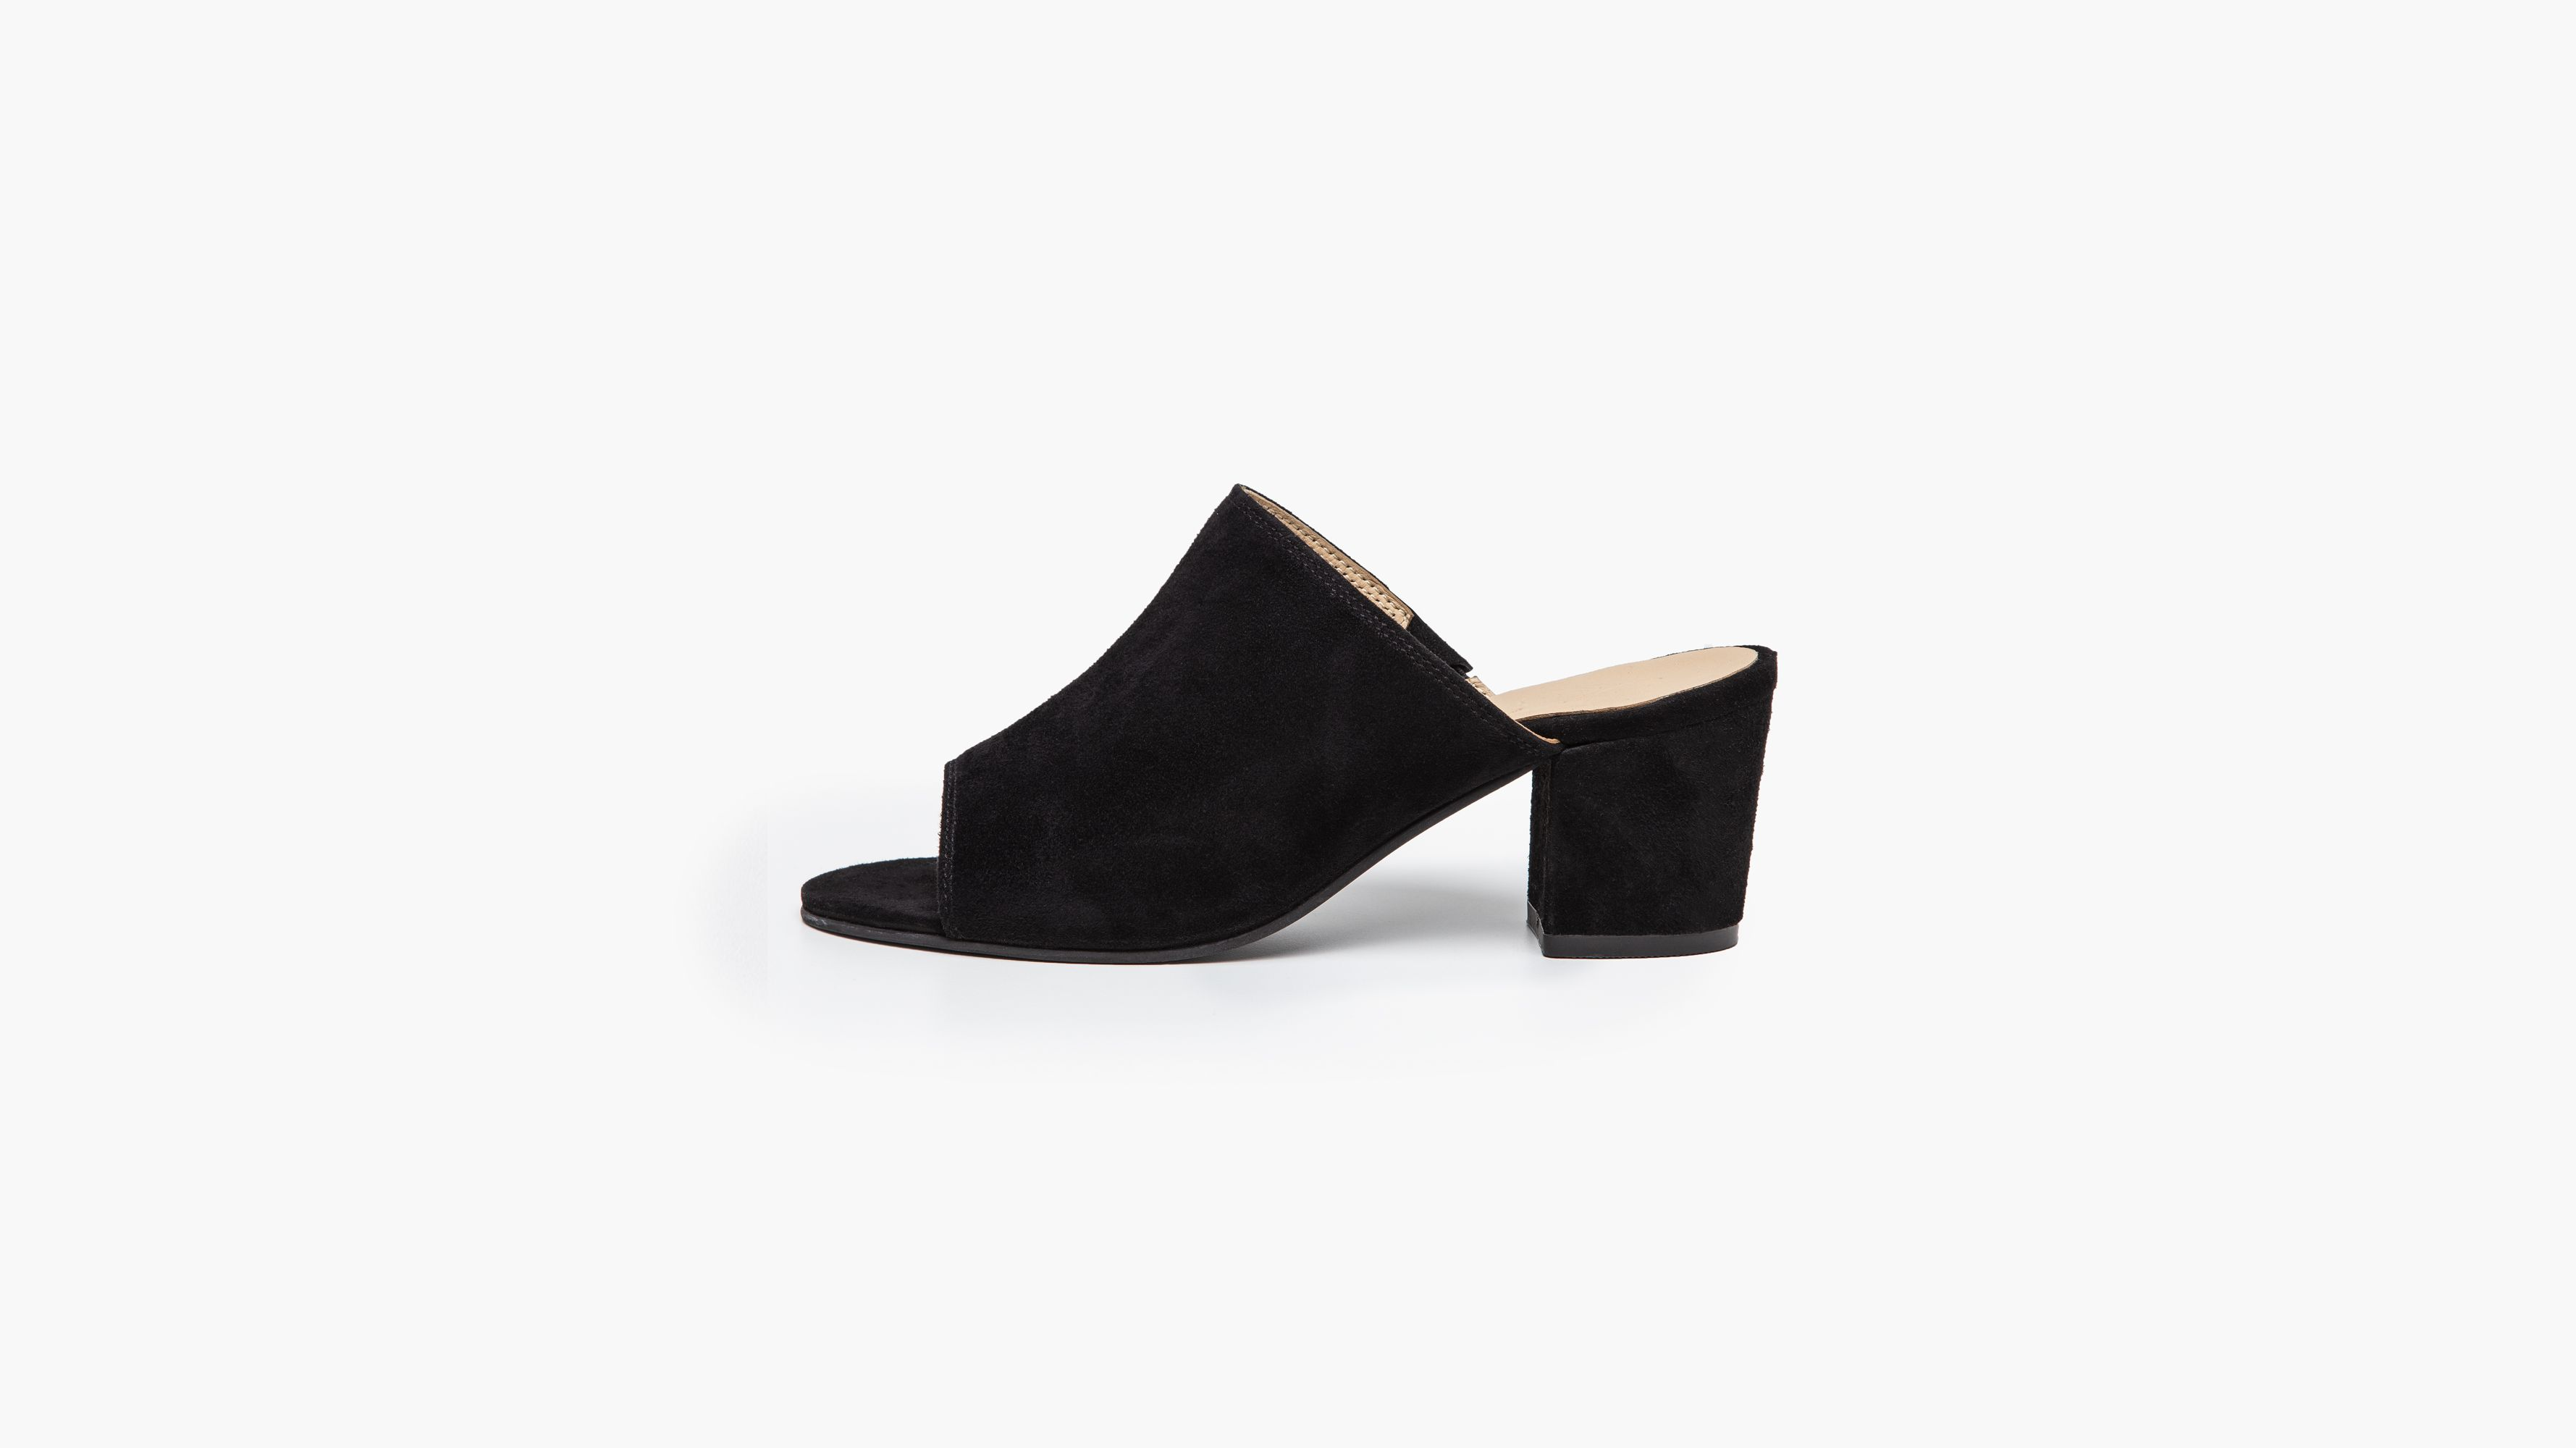 Femme Levi's® Chaussures Femme Fr Chaussures HqUEwvp